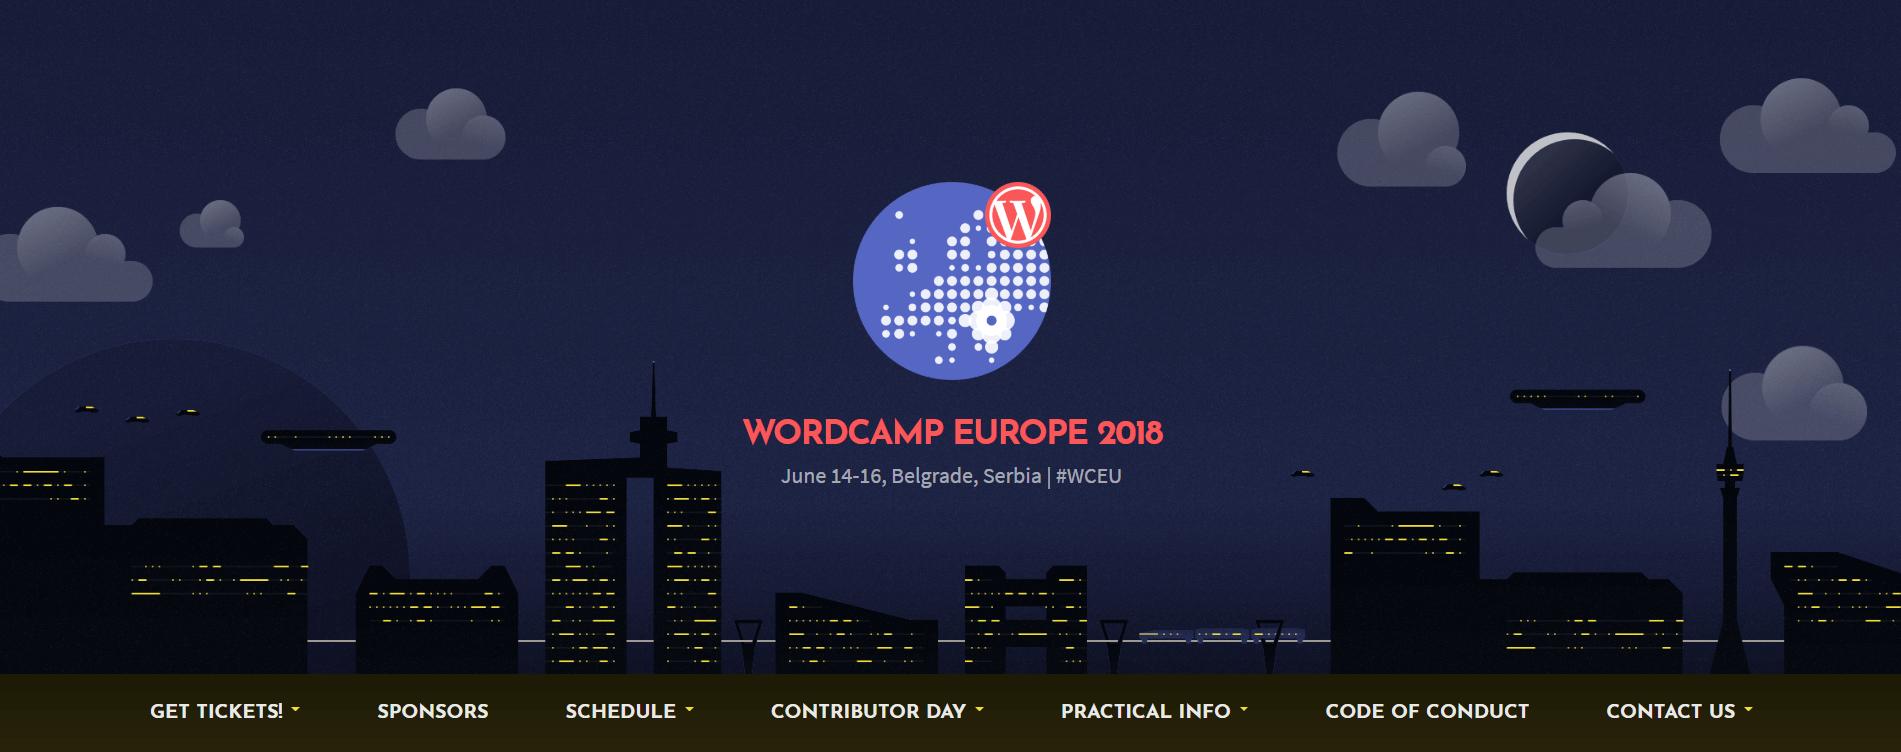 The WordCamp Europe 2018 website.